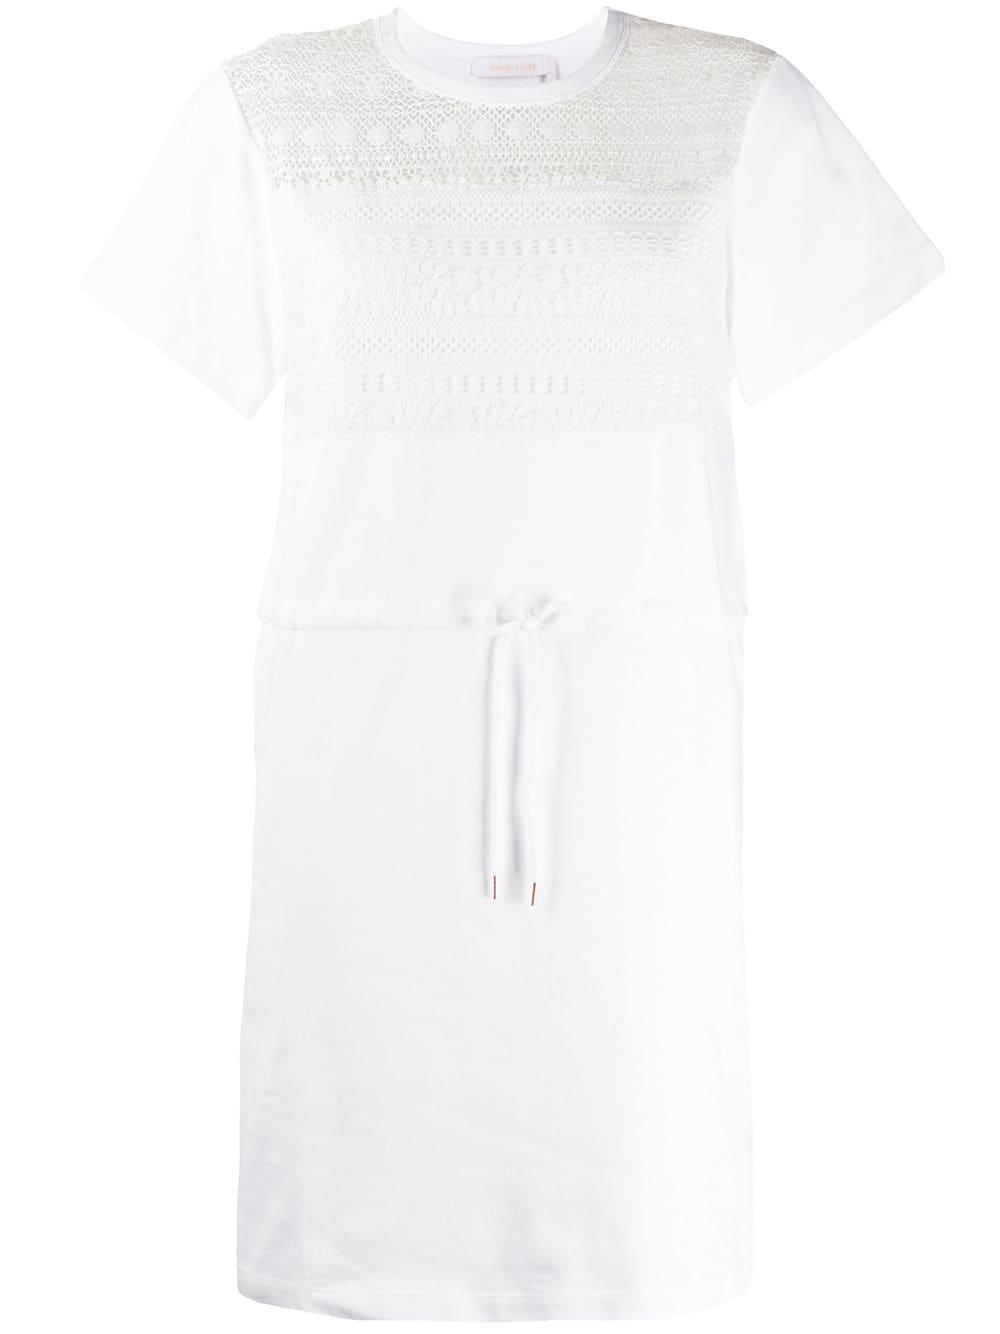 Fleece Lace Dress With Drawstring Belt Item # CHS20SJR34097